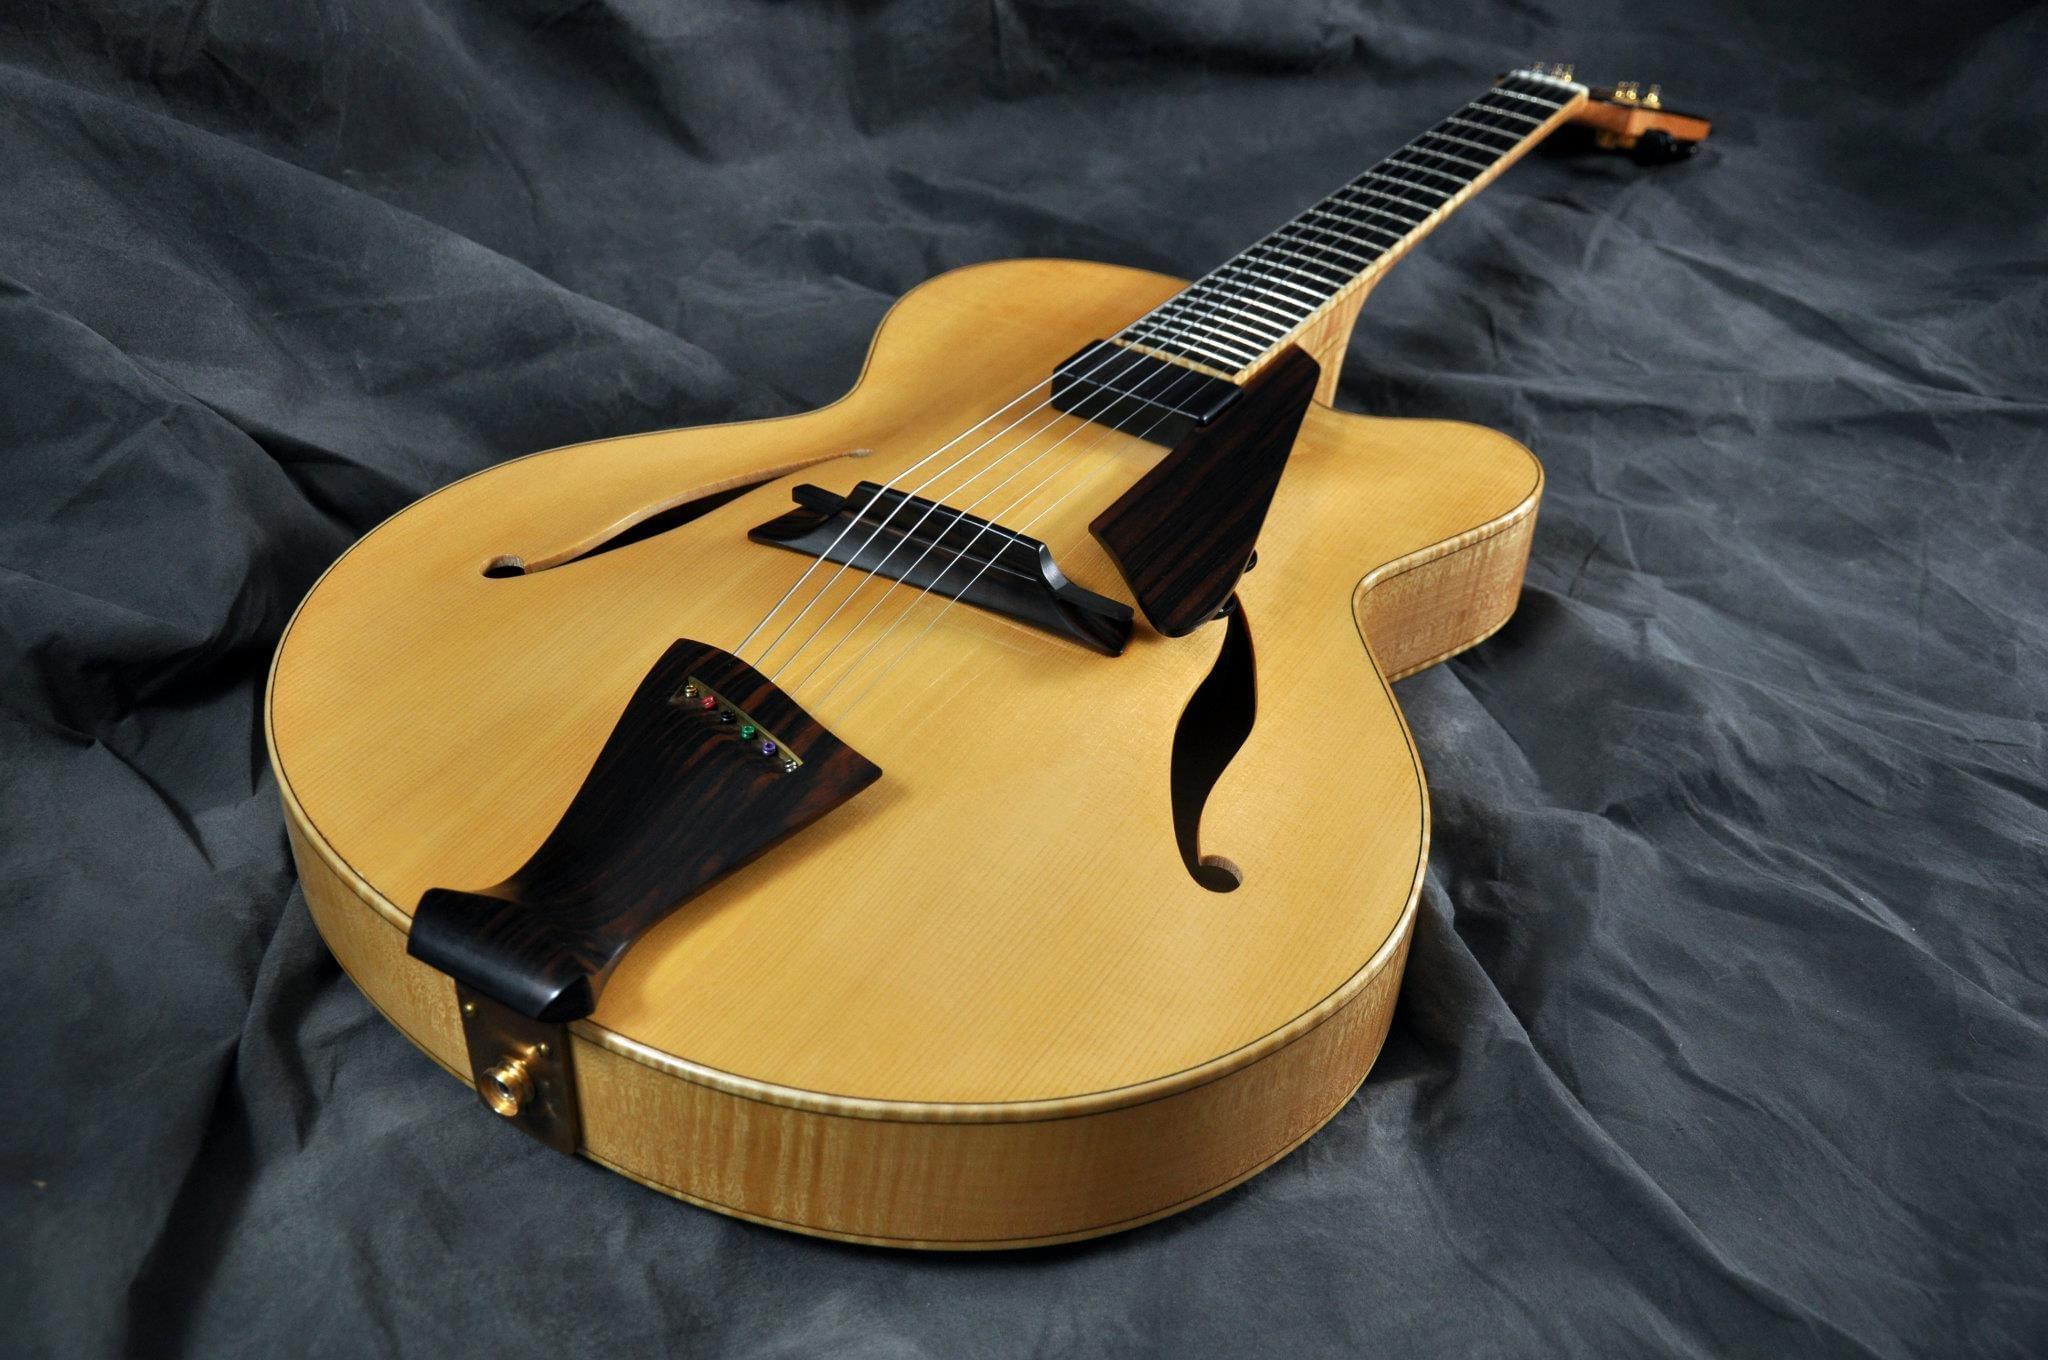 Mirabella build tread on The North American Guitar-0b8300da-5cb0-4fe3-bc83-c6146567bc87-jpeg